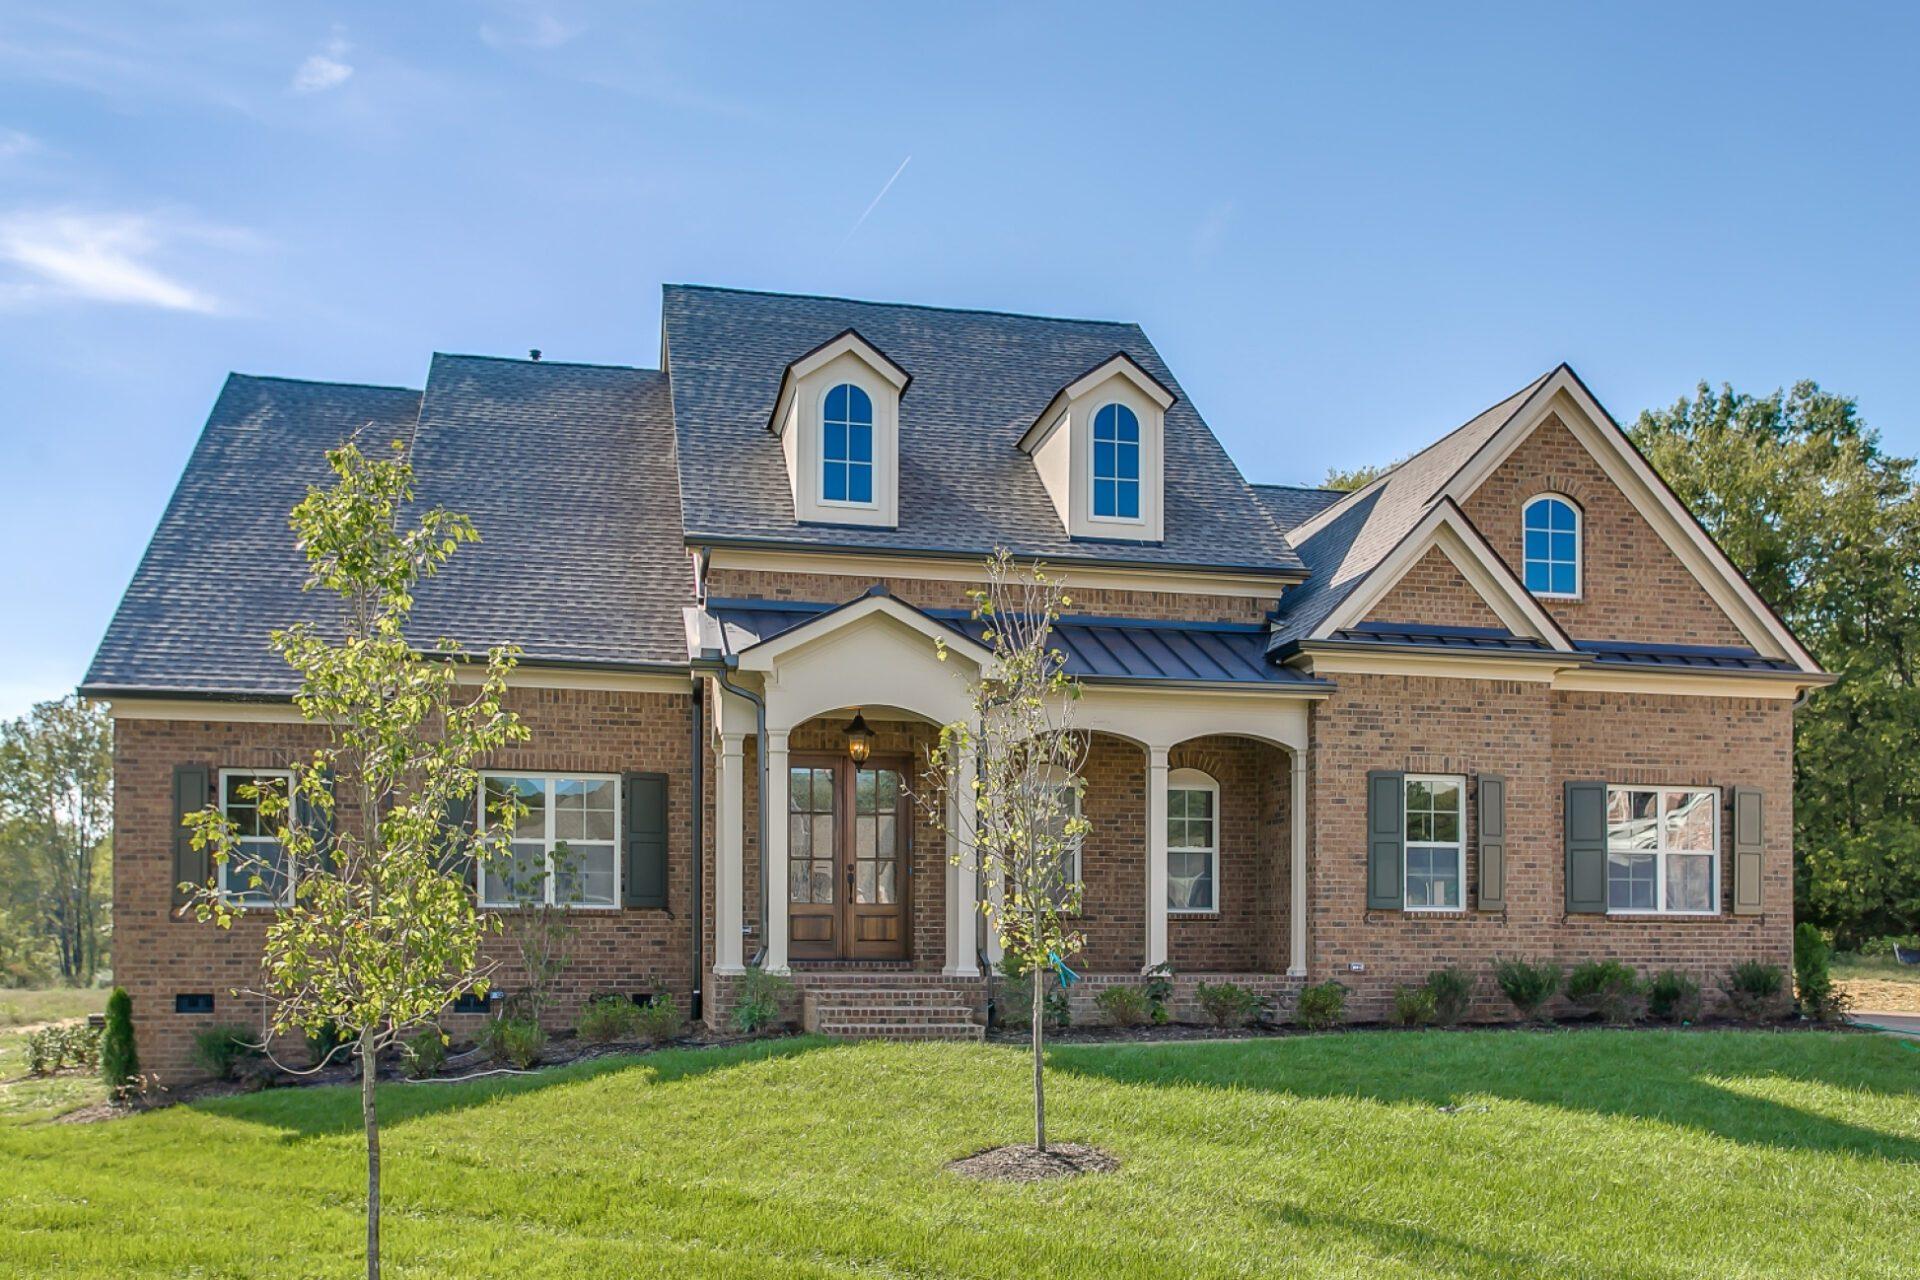 HERO - Premier, High-end home builders for luxury homes - luxury home builder | Nashville, TN